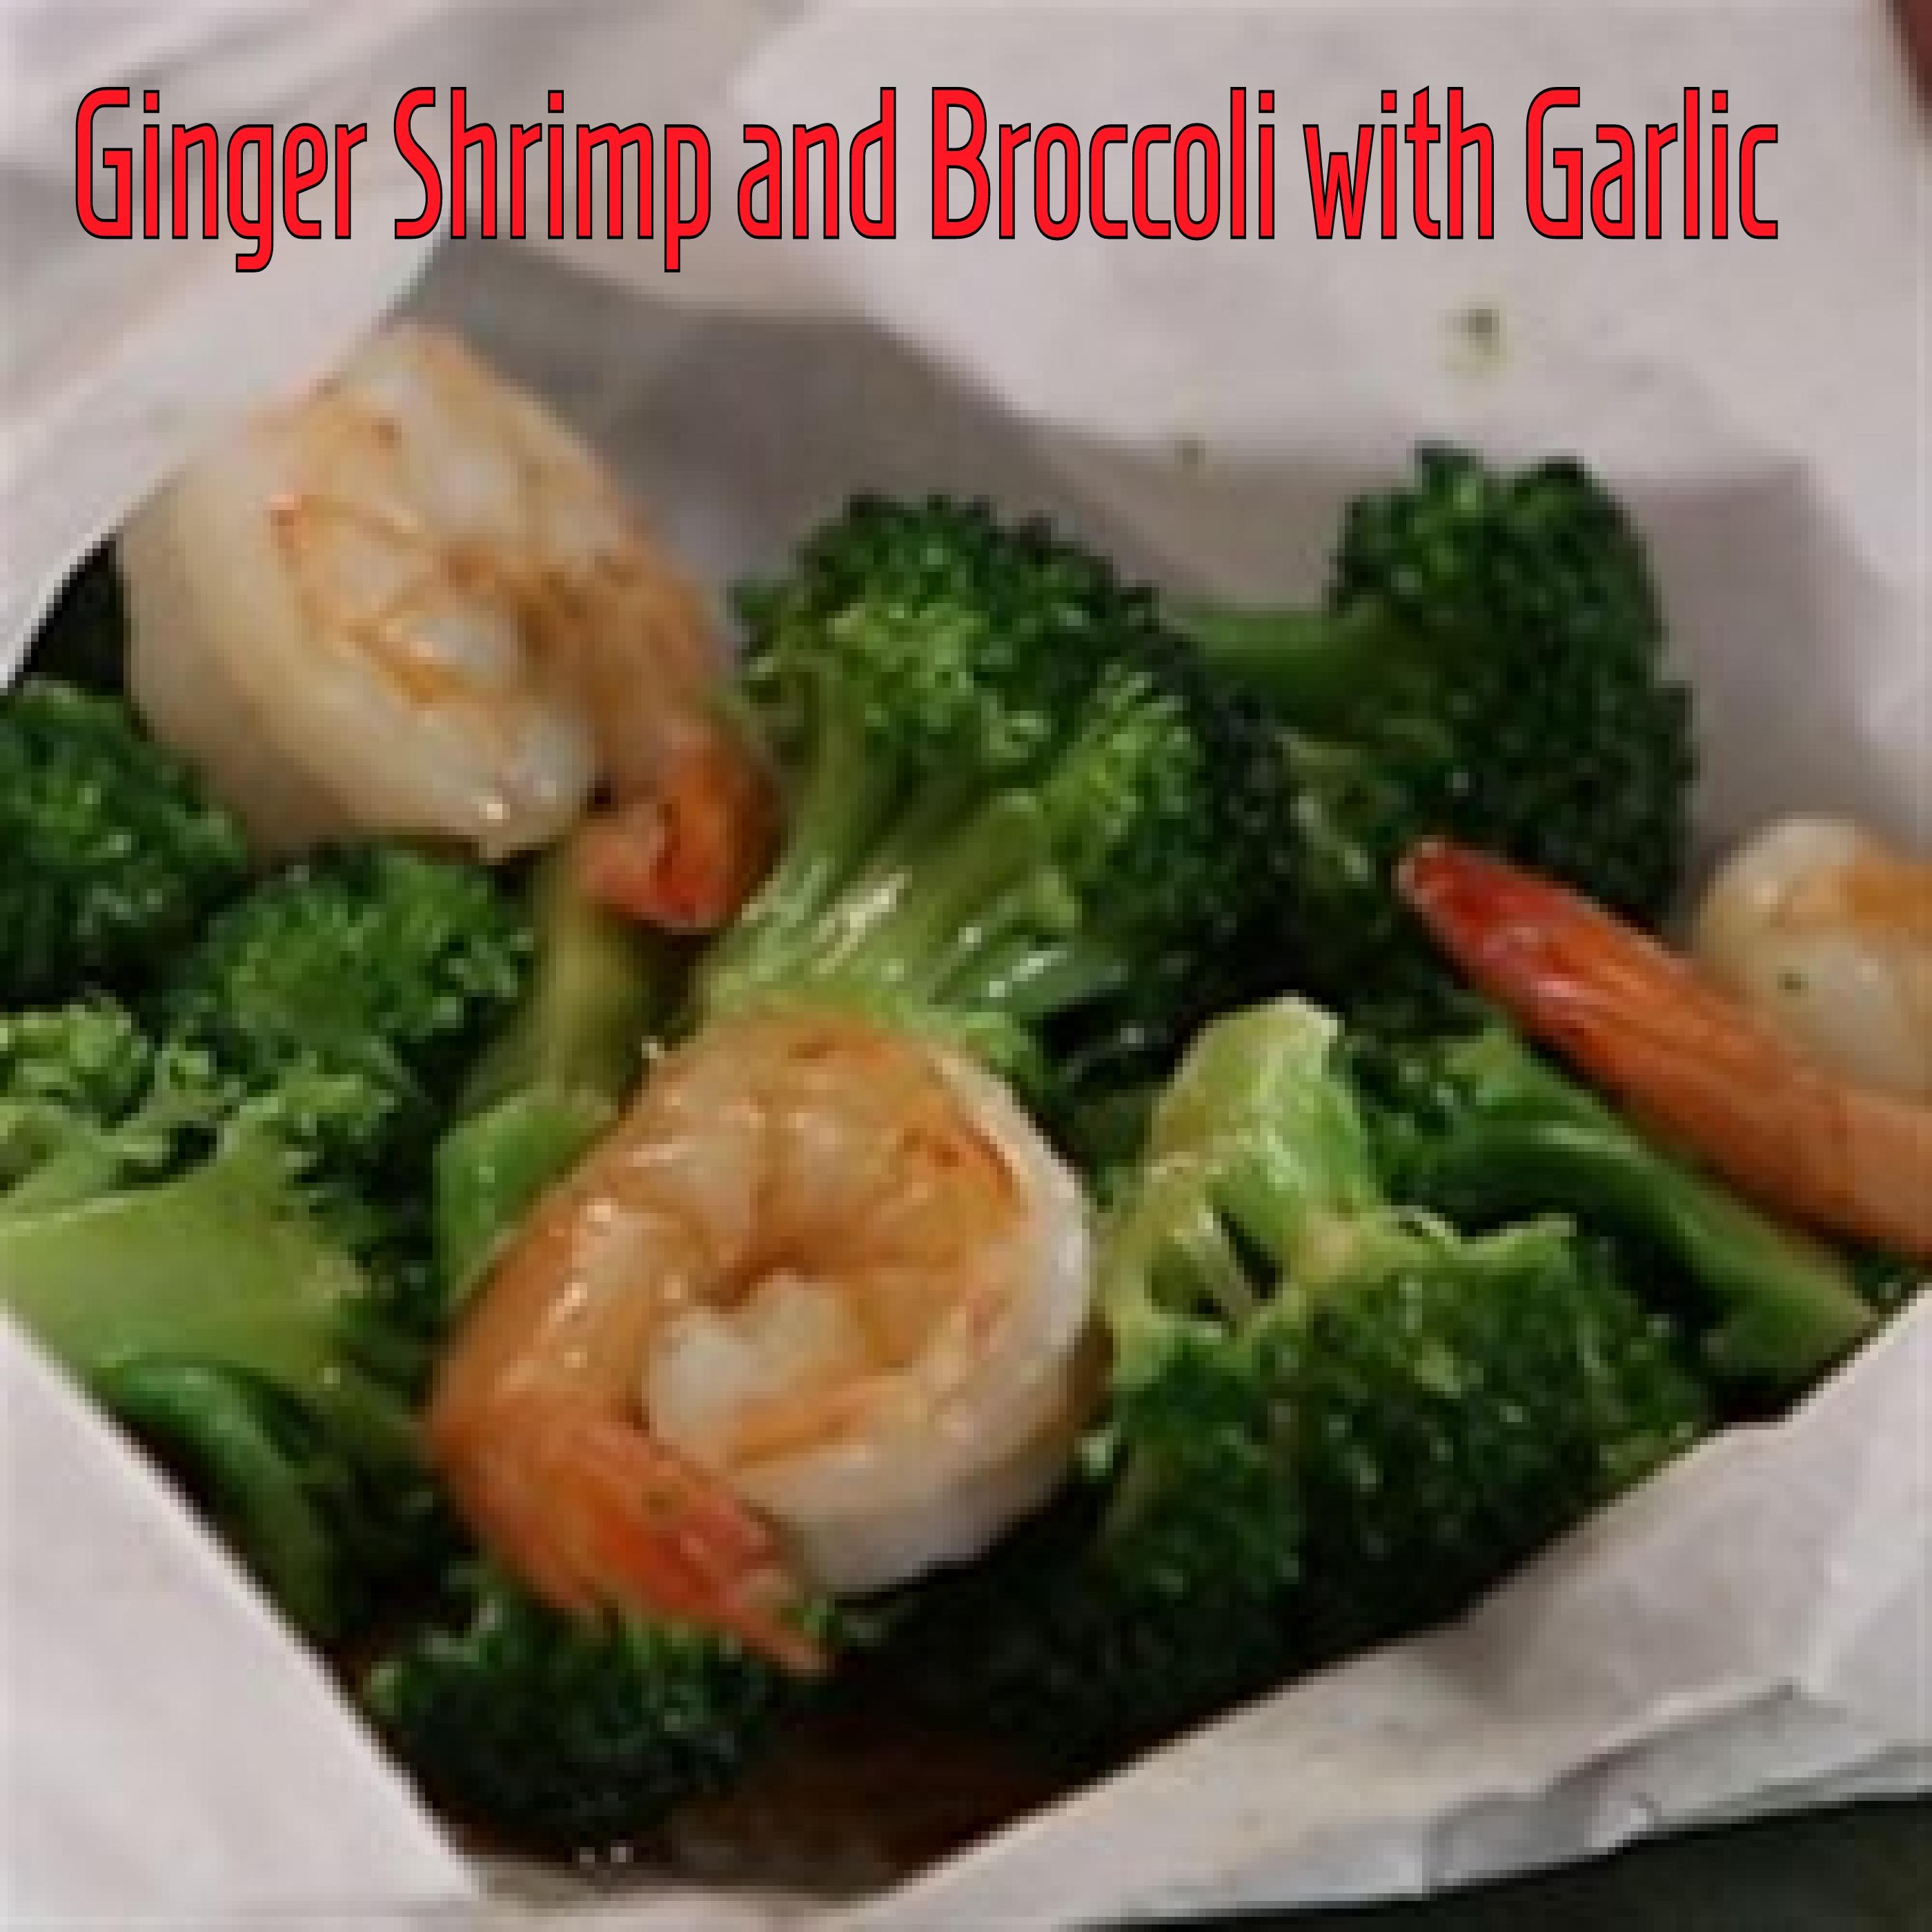 Utokia's Ginger Shrimp and Broccoli with Garlic RevN